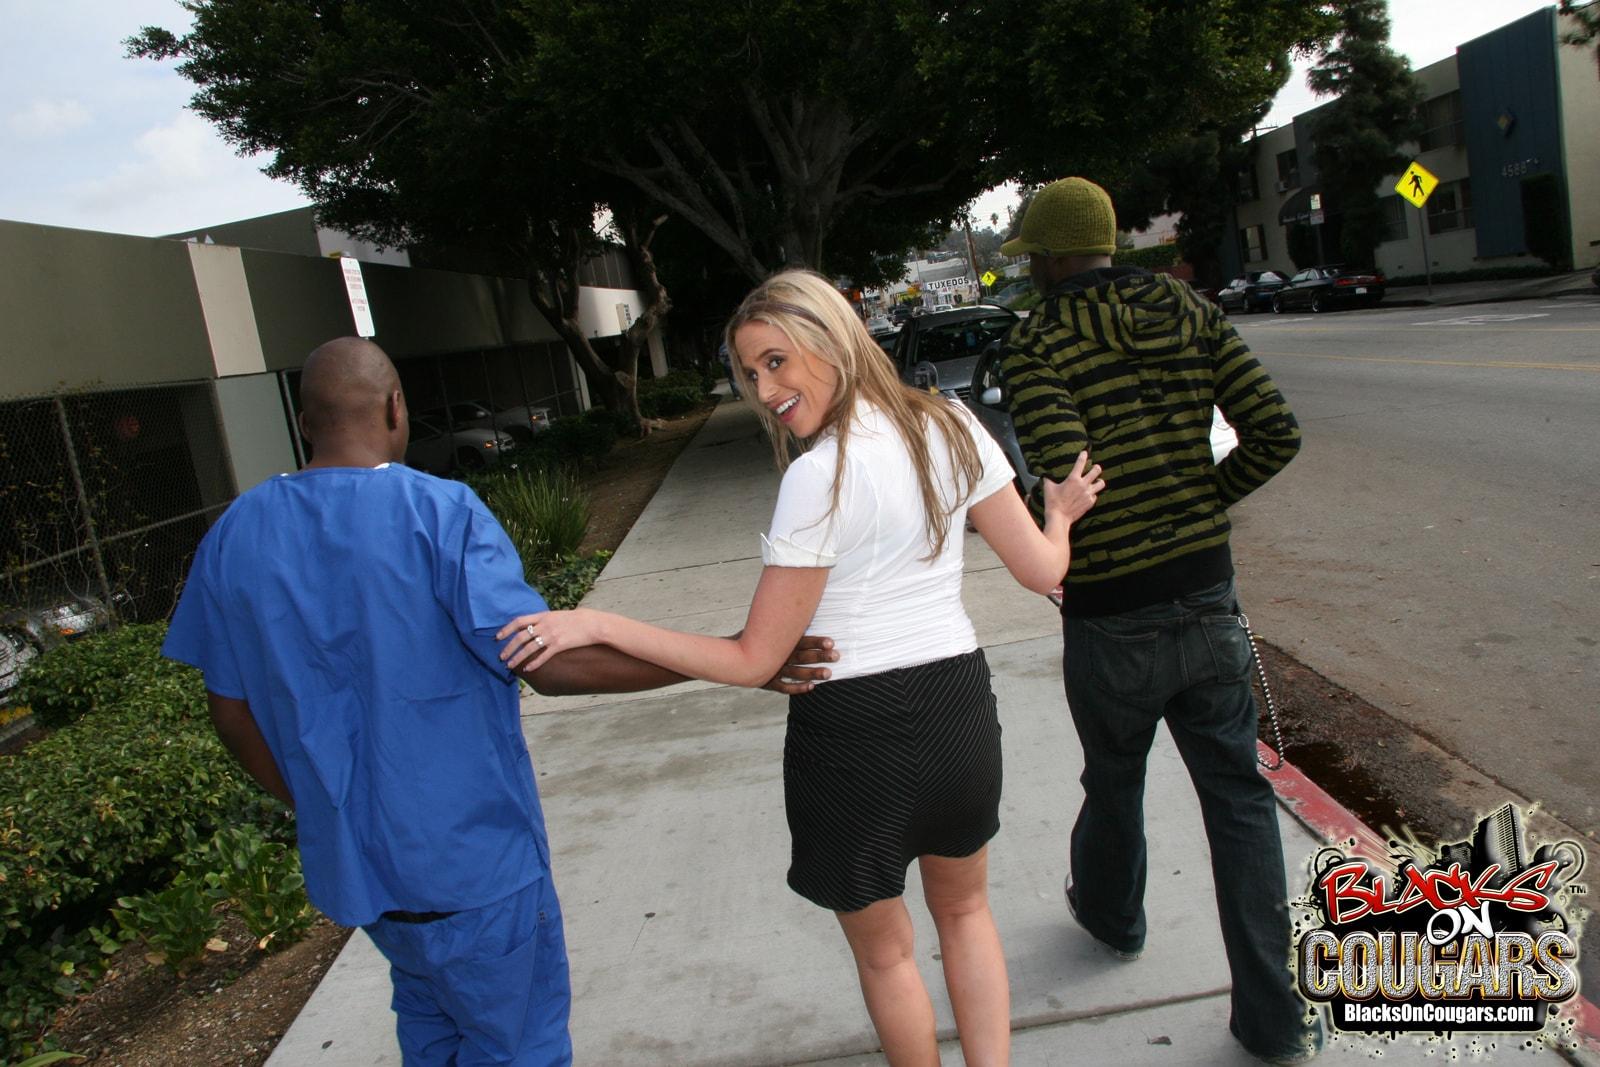 Dogfart '- Blacks On Cougars' starring Kylie Worthy (Photo 3)